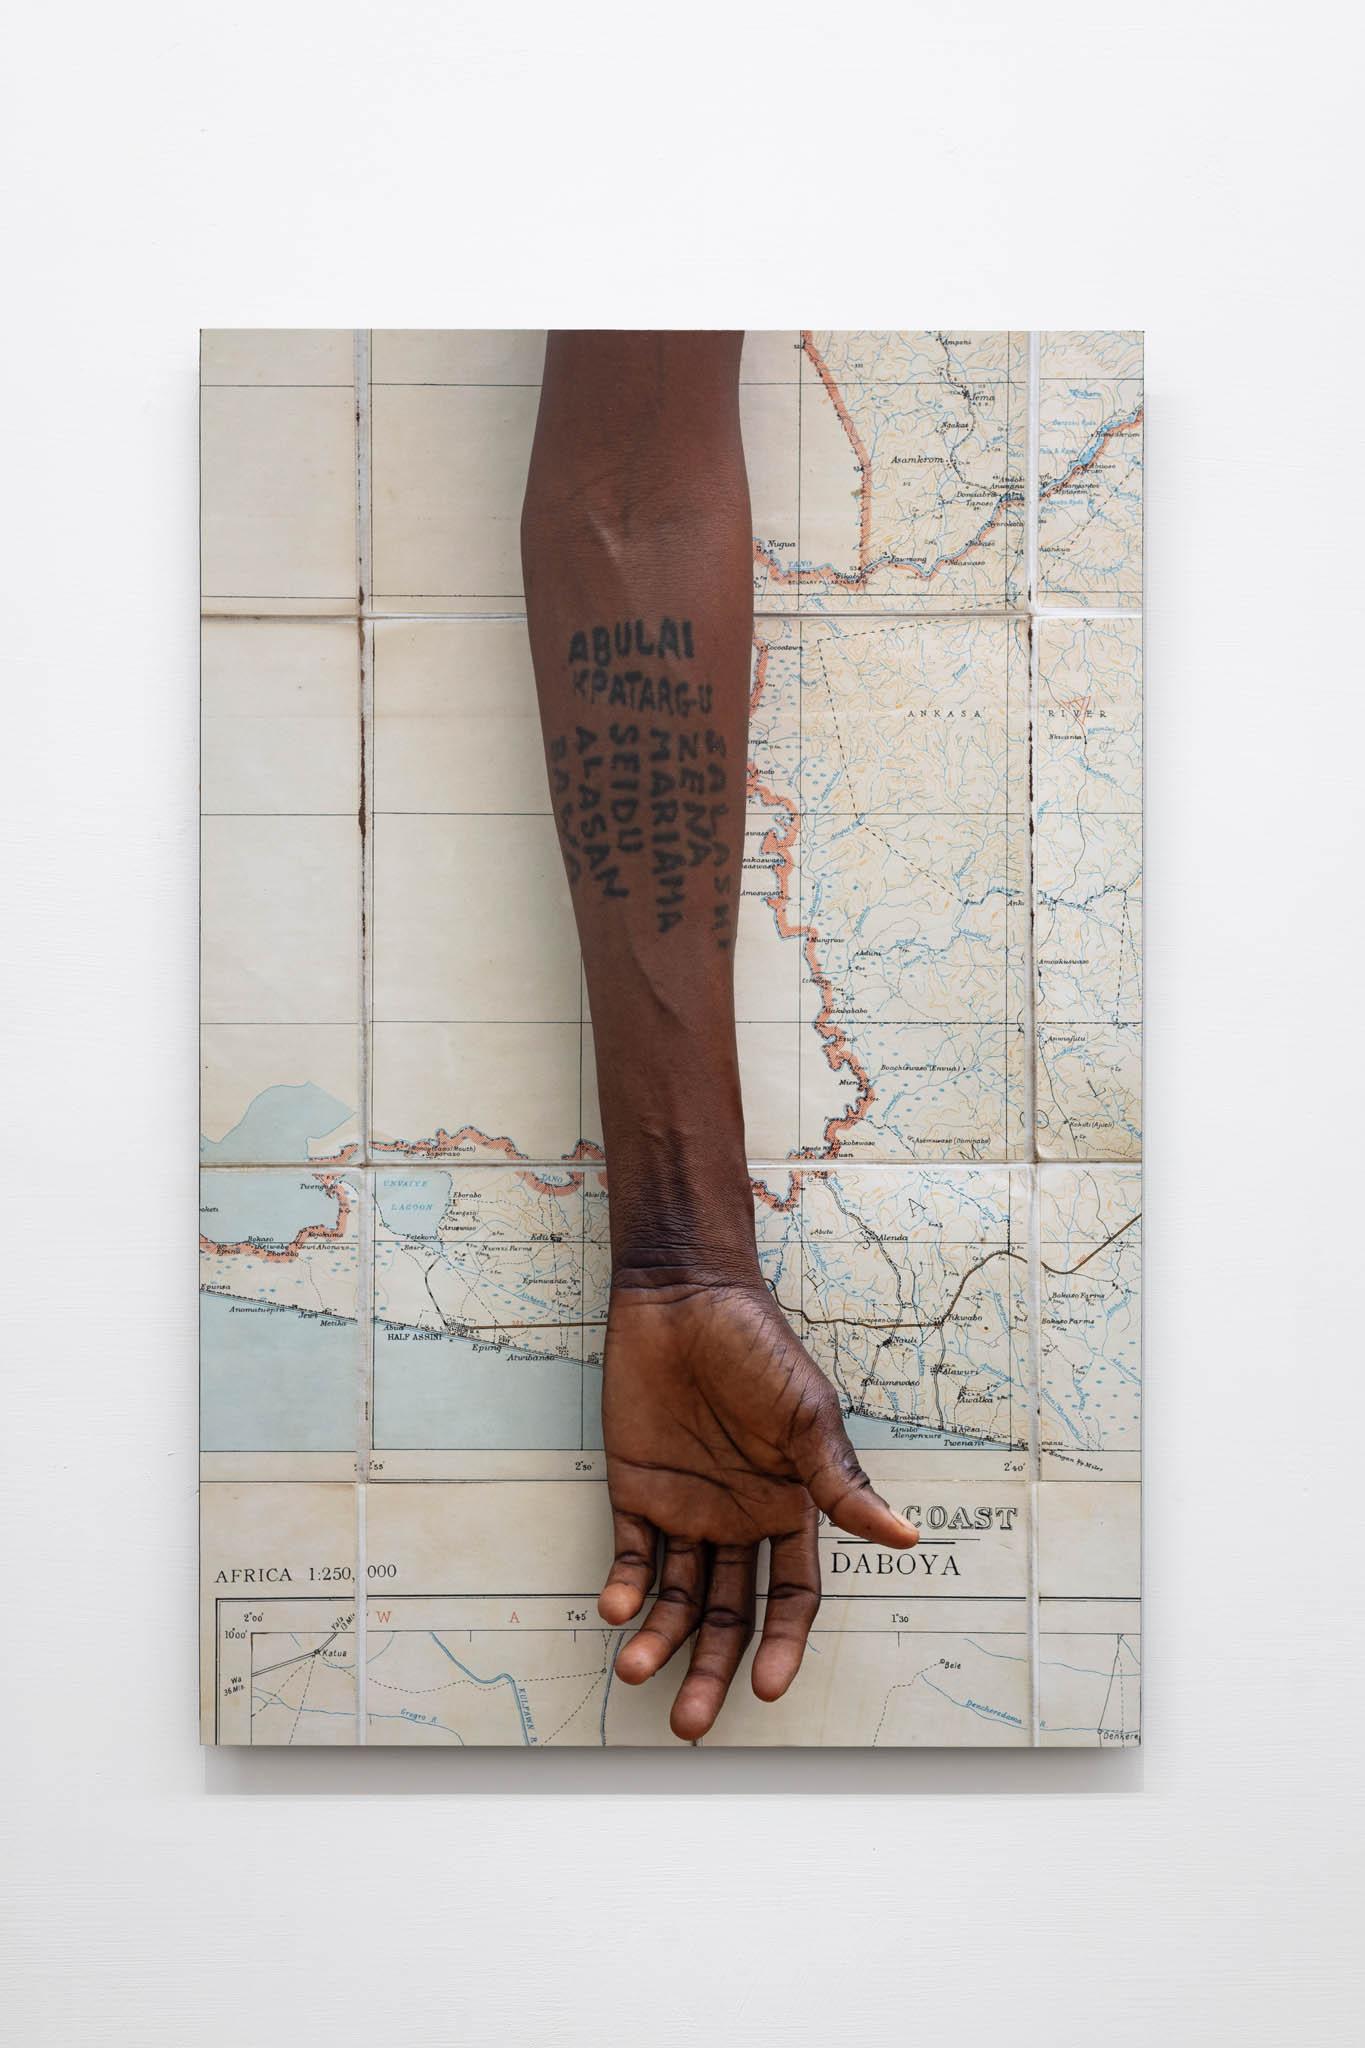 Ibrahim Mahama Seidu Bawu Daboya, 2019; C-print, 70 x 50 cm; foto Giorgio Benni